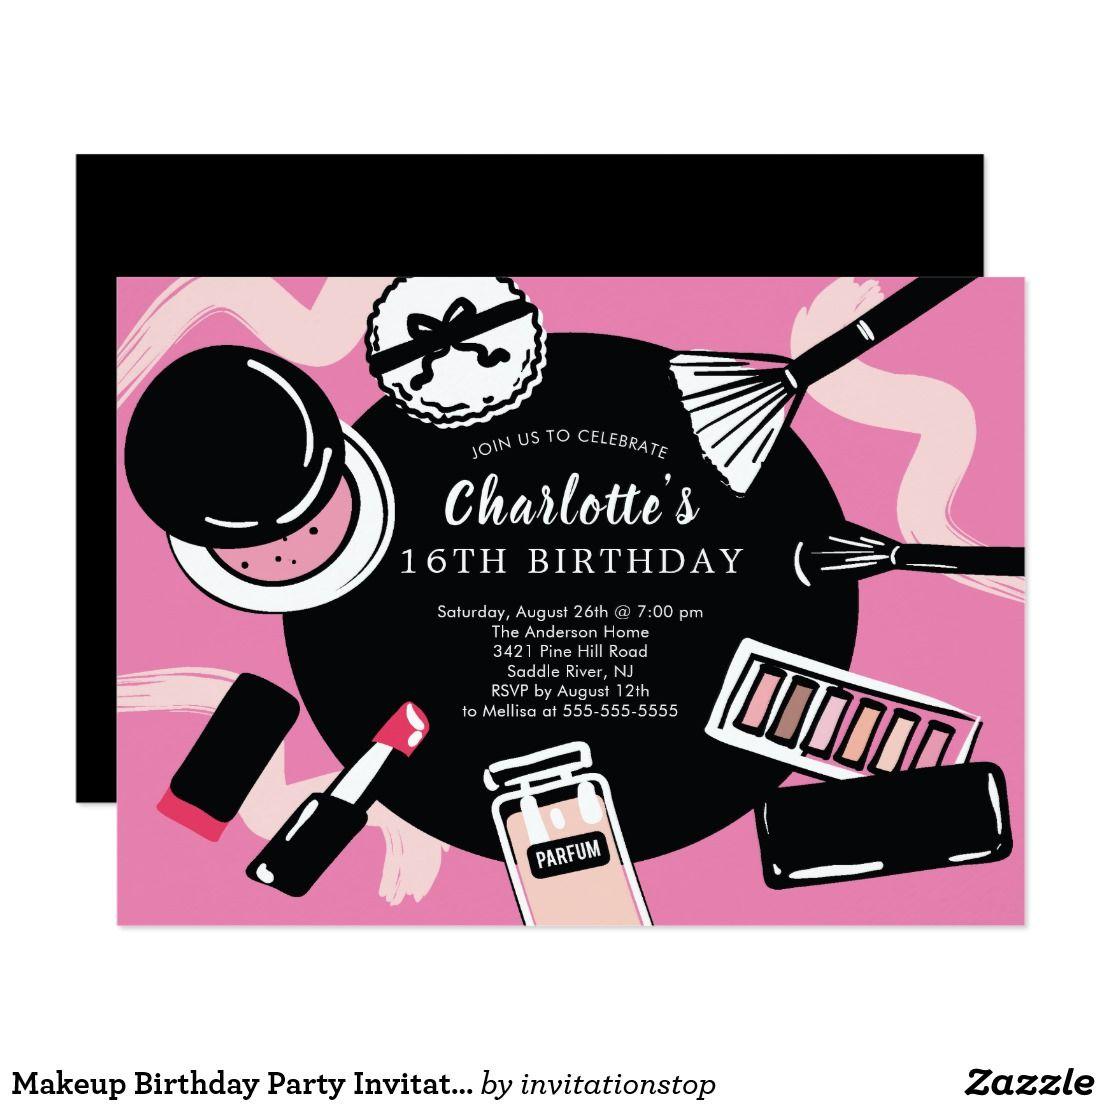 Makeup Birthday Party Invitation Zazzle Com Fondo De Pantalla Colorido Fondo